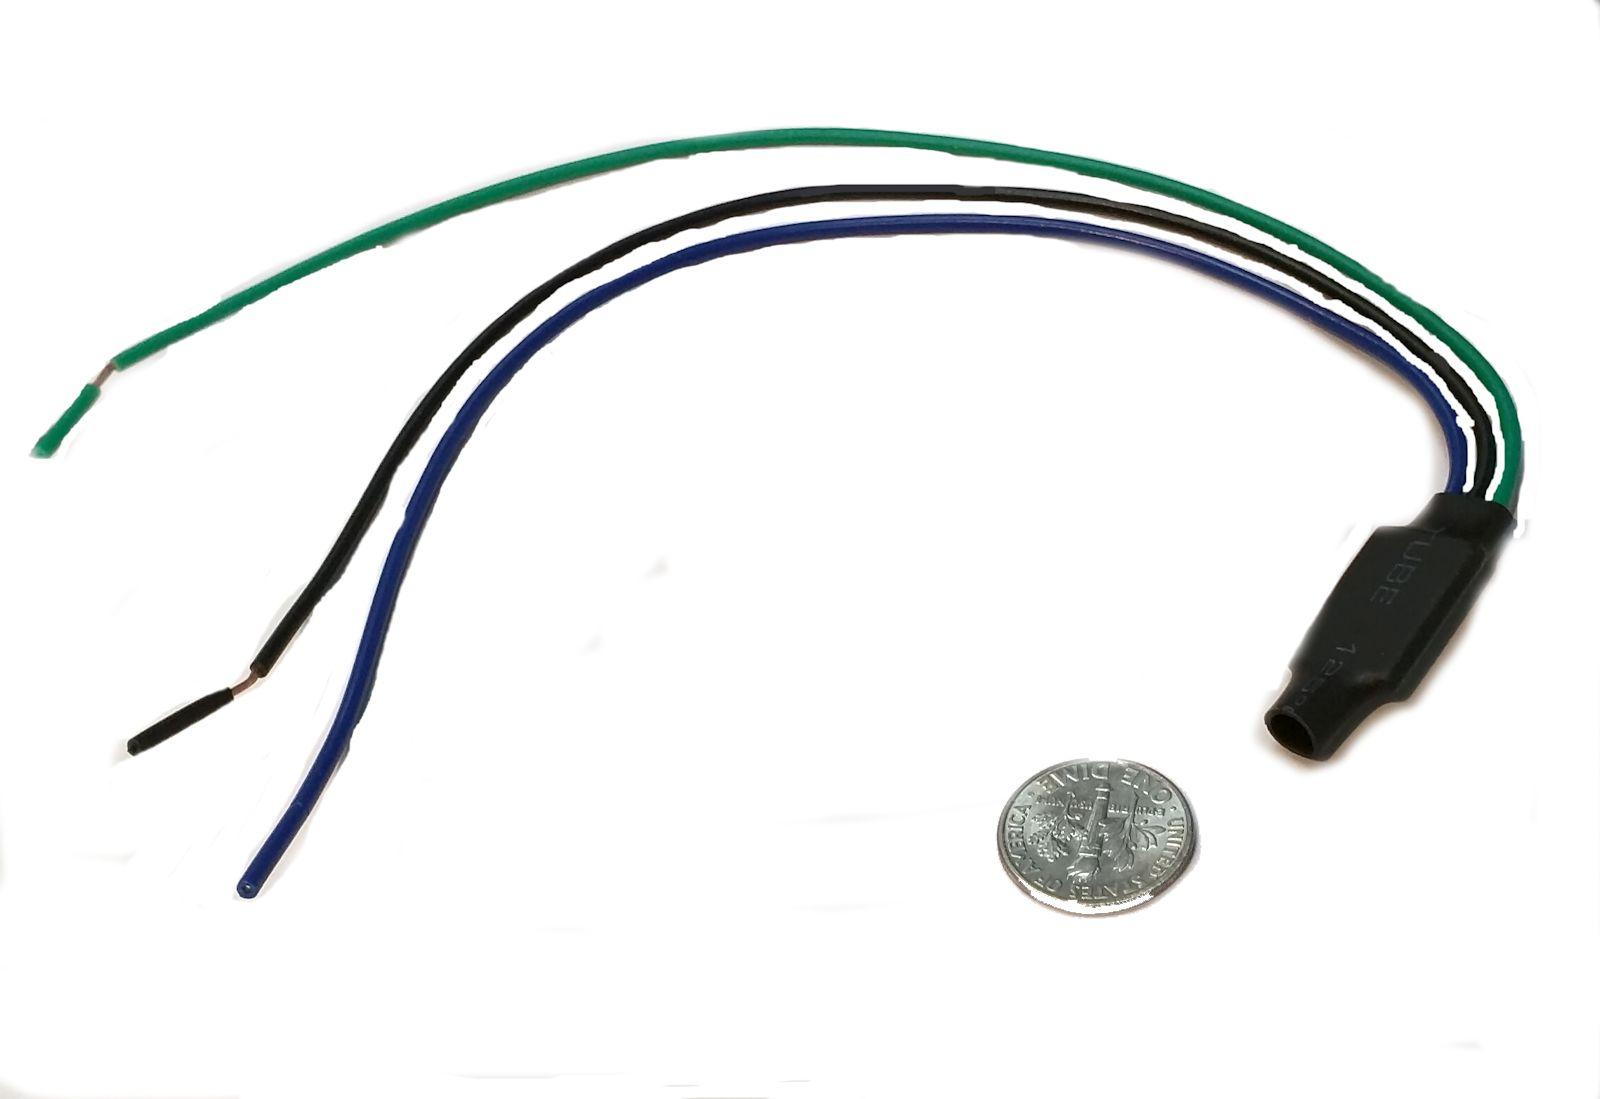 Pioneer AVHX5500BHS AVH-X5500BHS AVH-X1500DVD AVHX1500DVD iPod iPhone 5 Cable